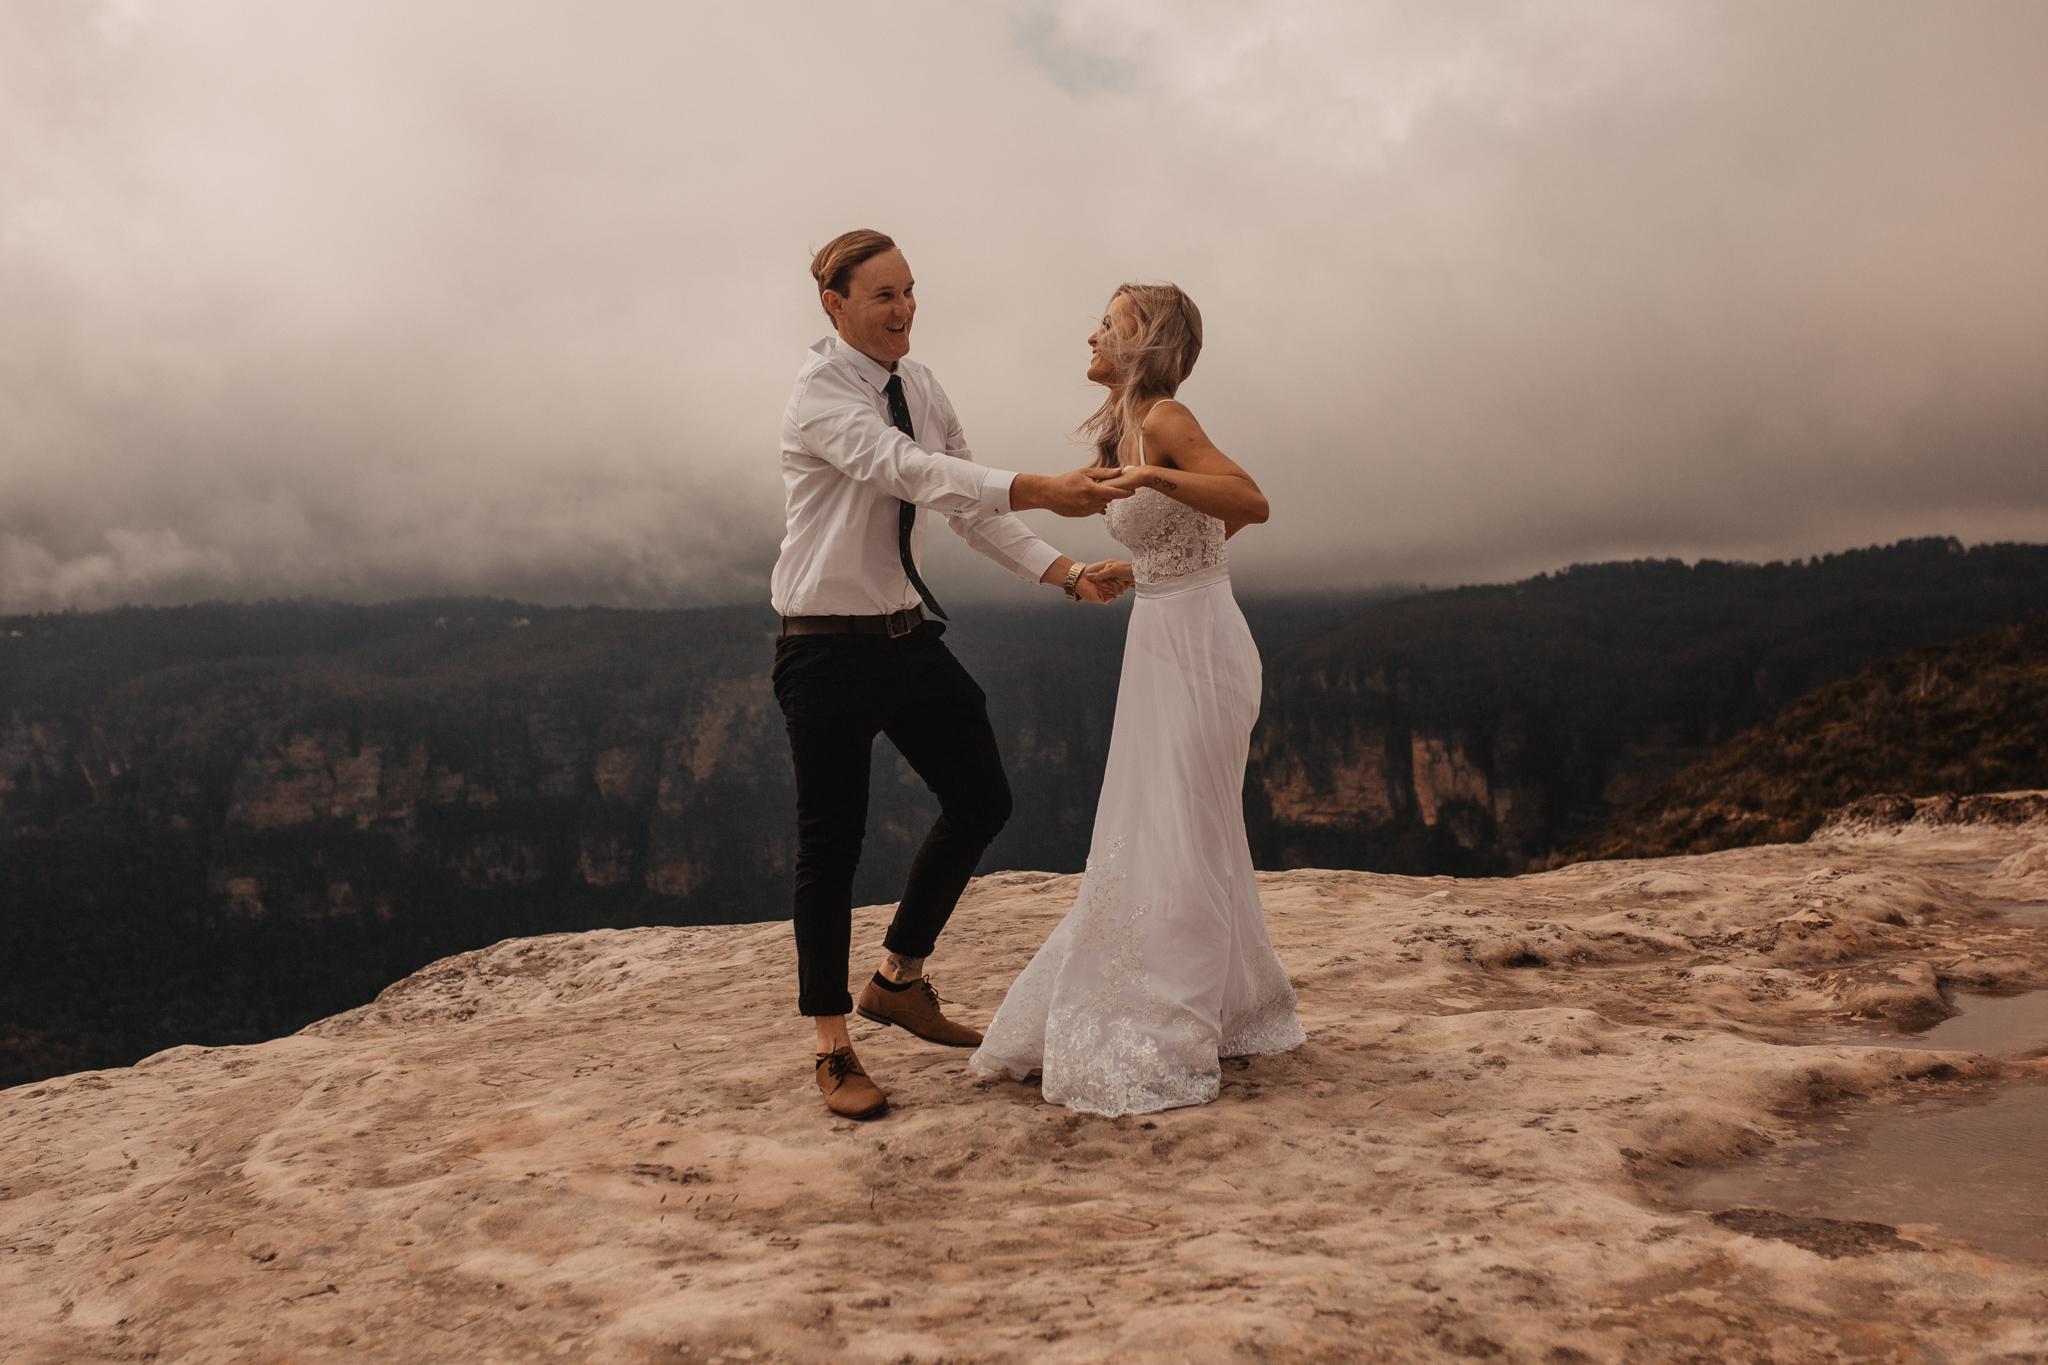 blue-mountains-australia-elopement-237.jpg